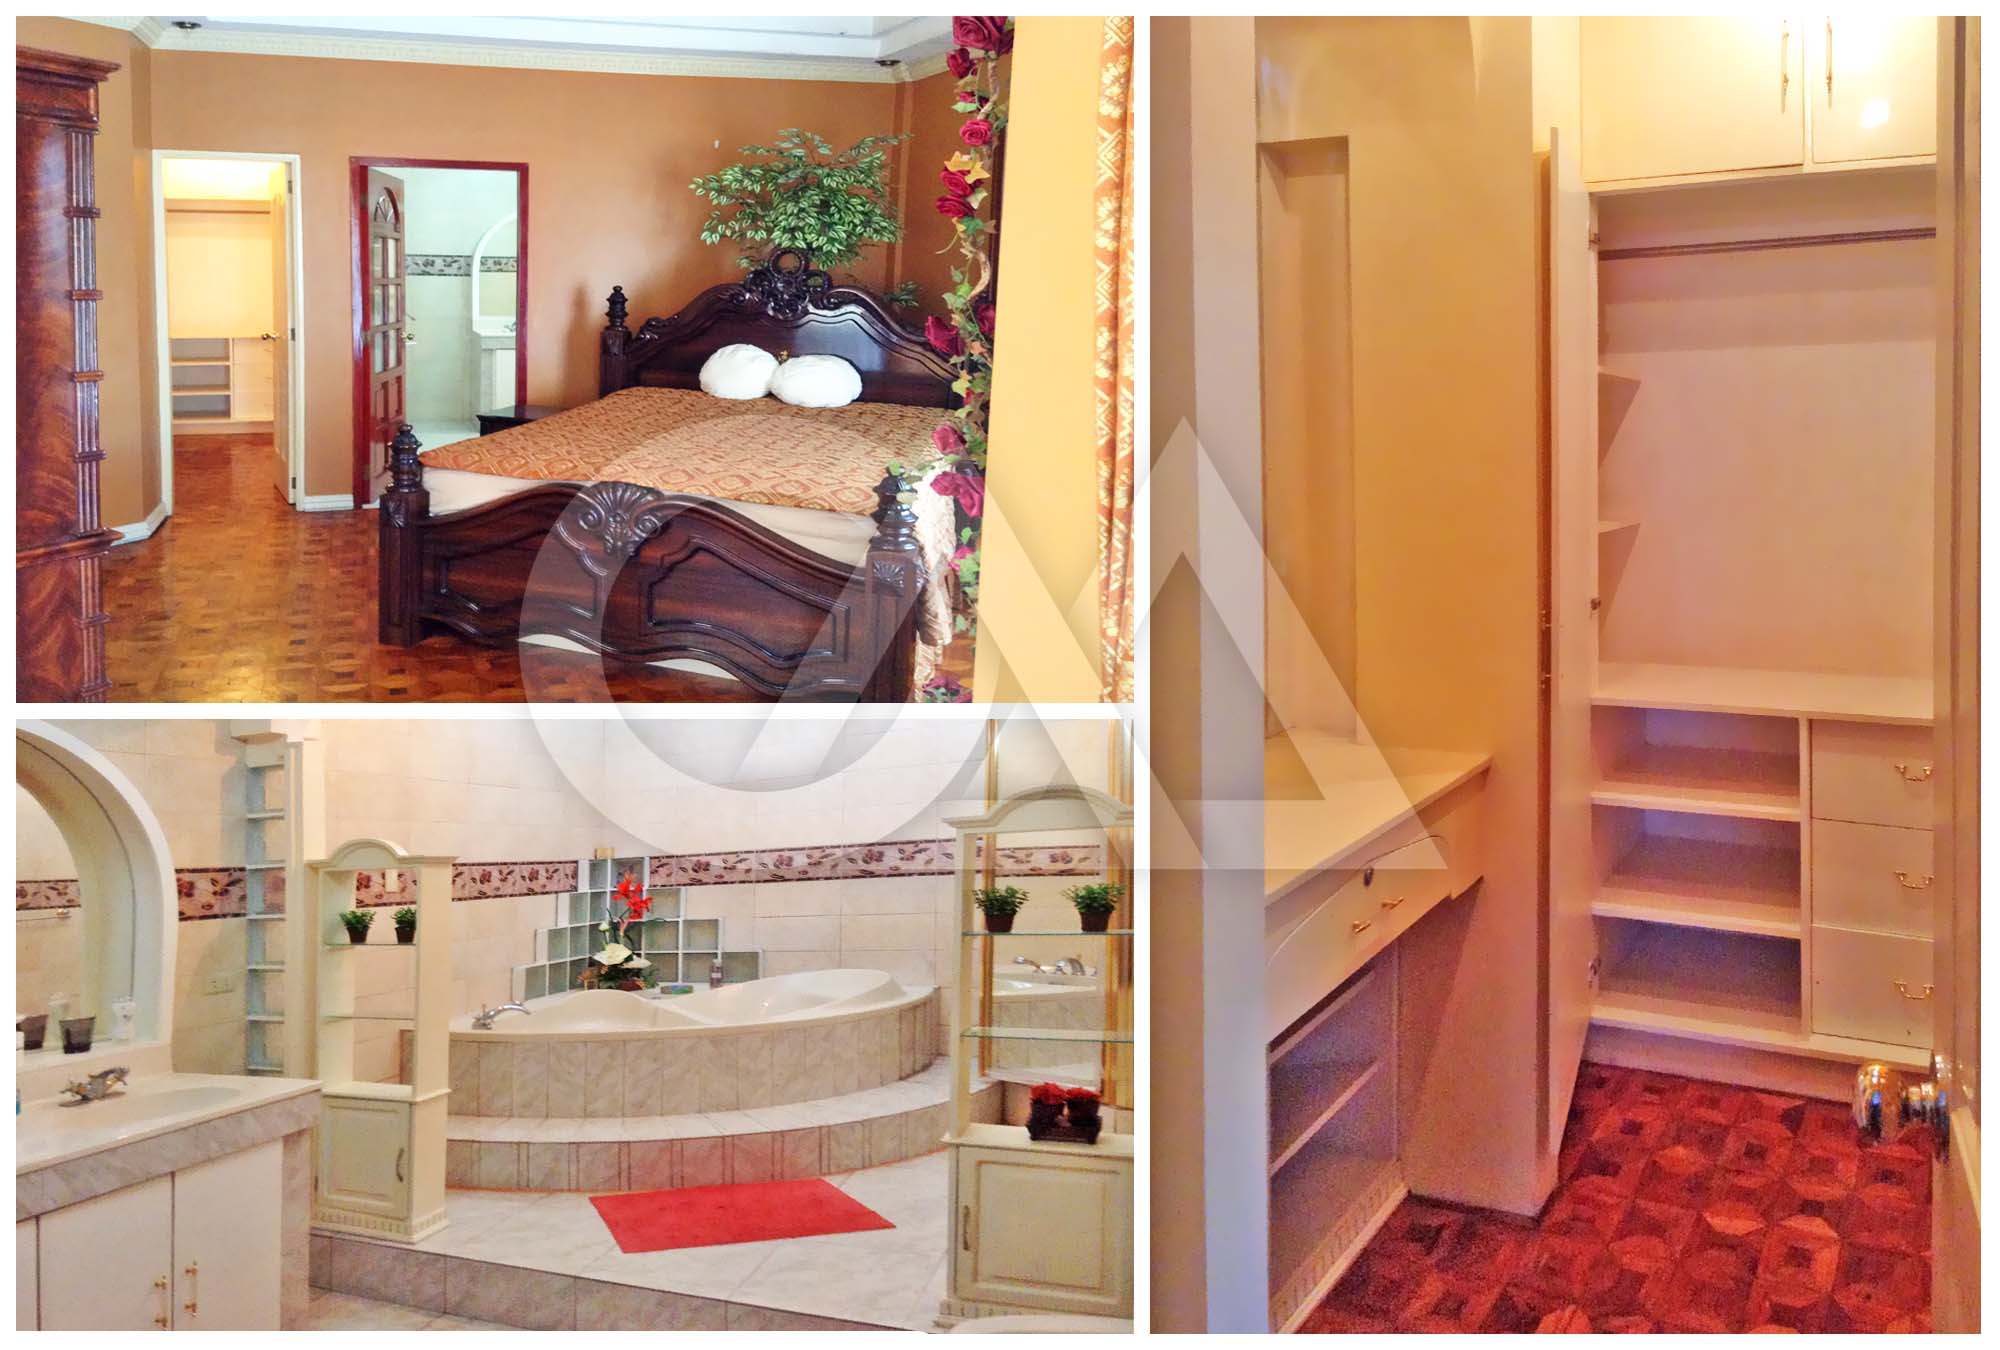 Master's; Bath Enclosure, Bathtub, Walk-In Closet, Balcony